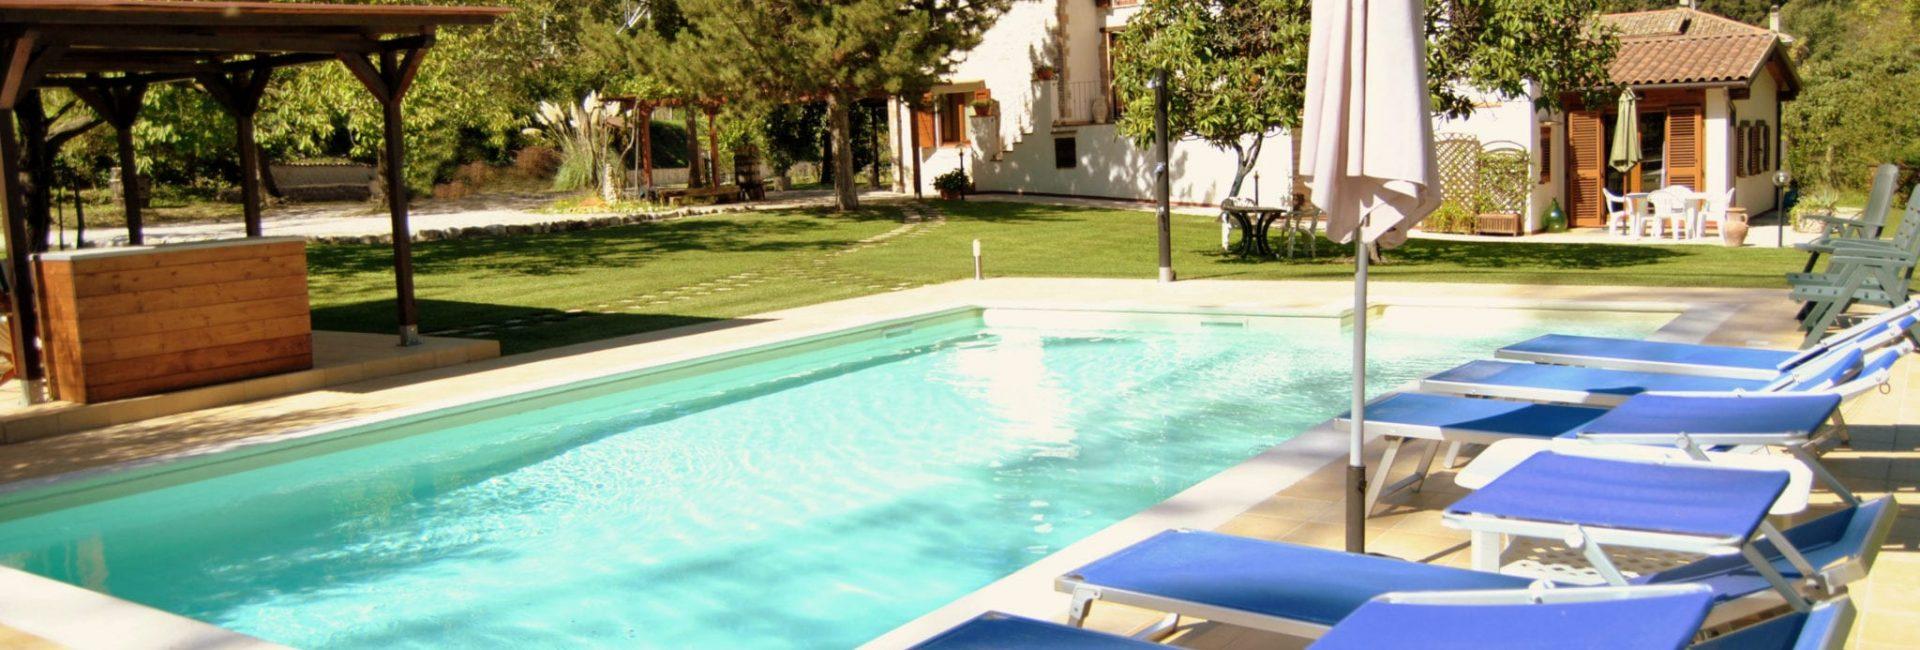 piscina 5